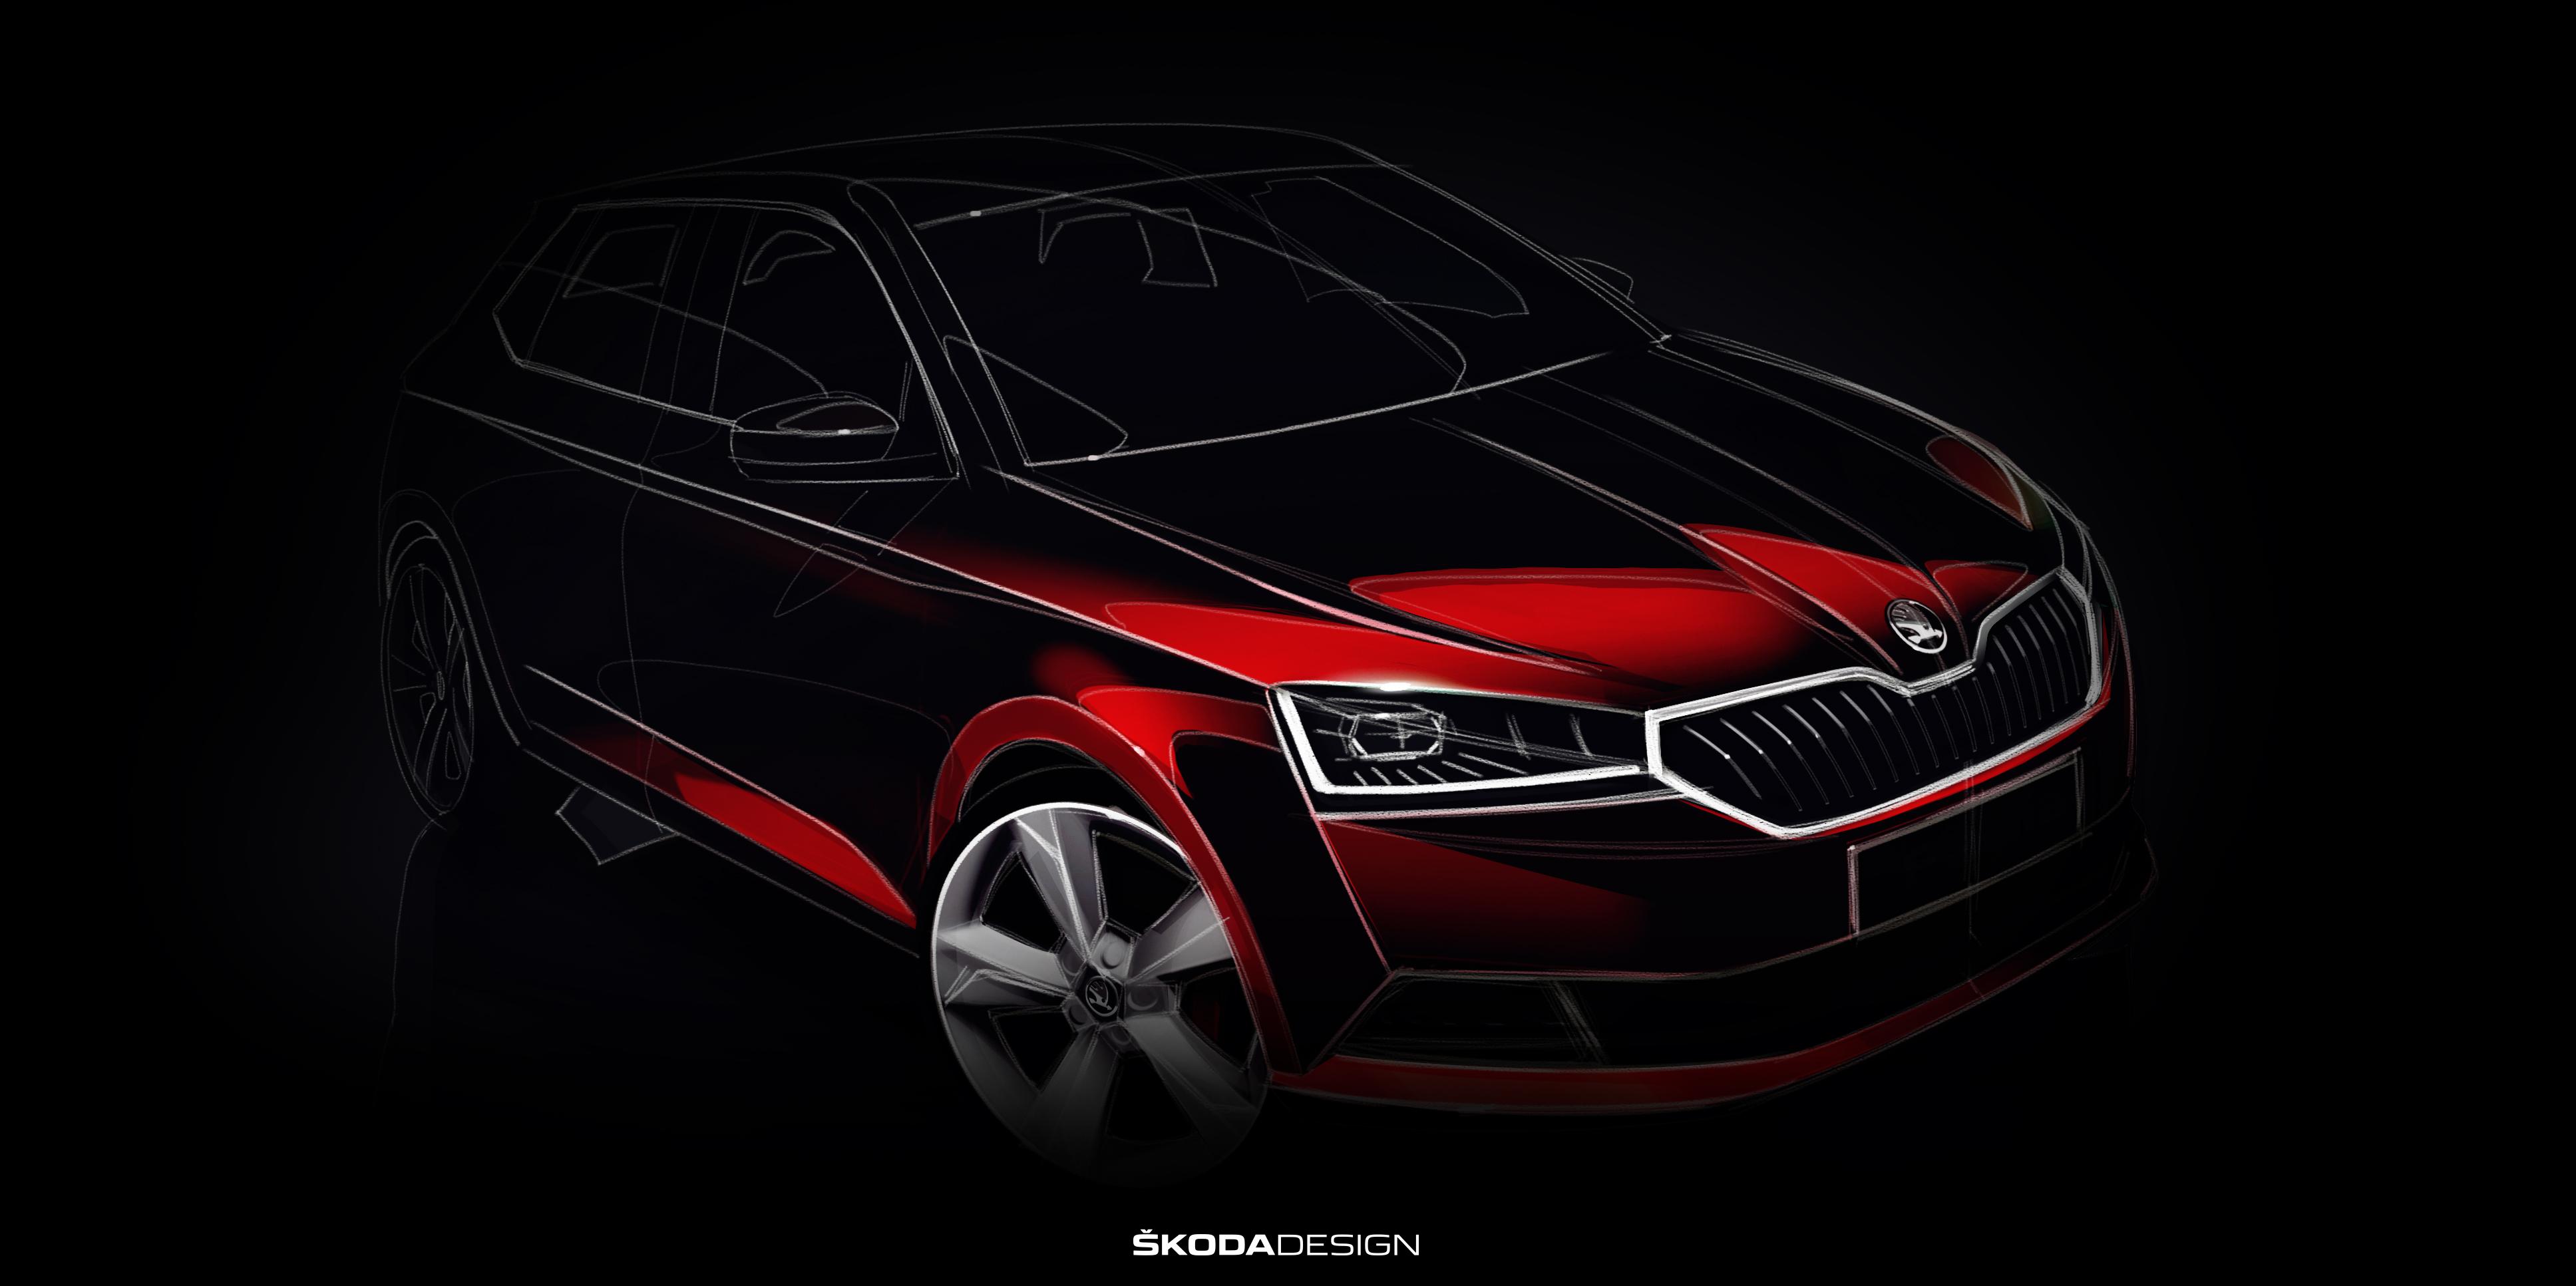 World Premiere Of The Updated ŠKODA FABIA At The Geneva Motor Show - Overhaul car show